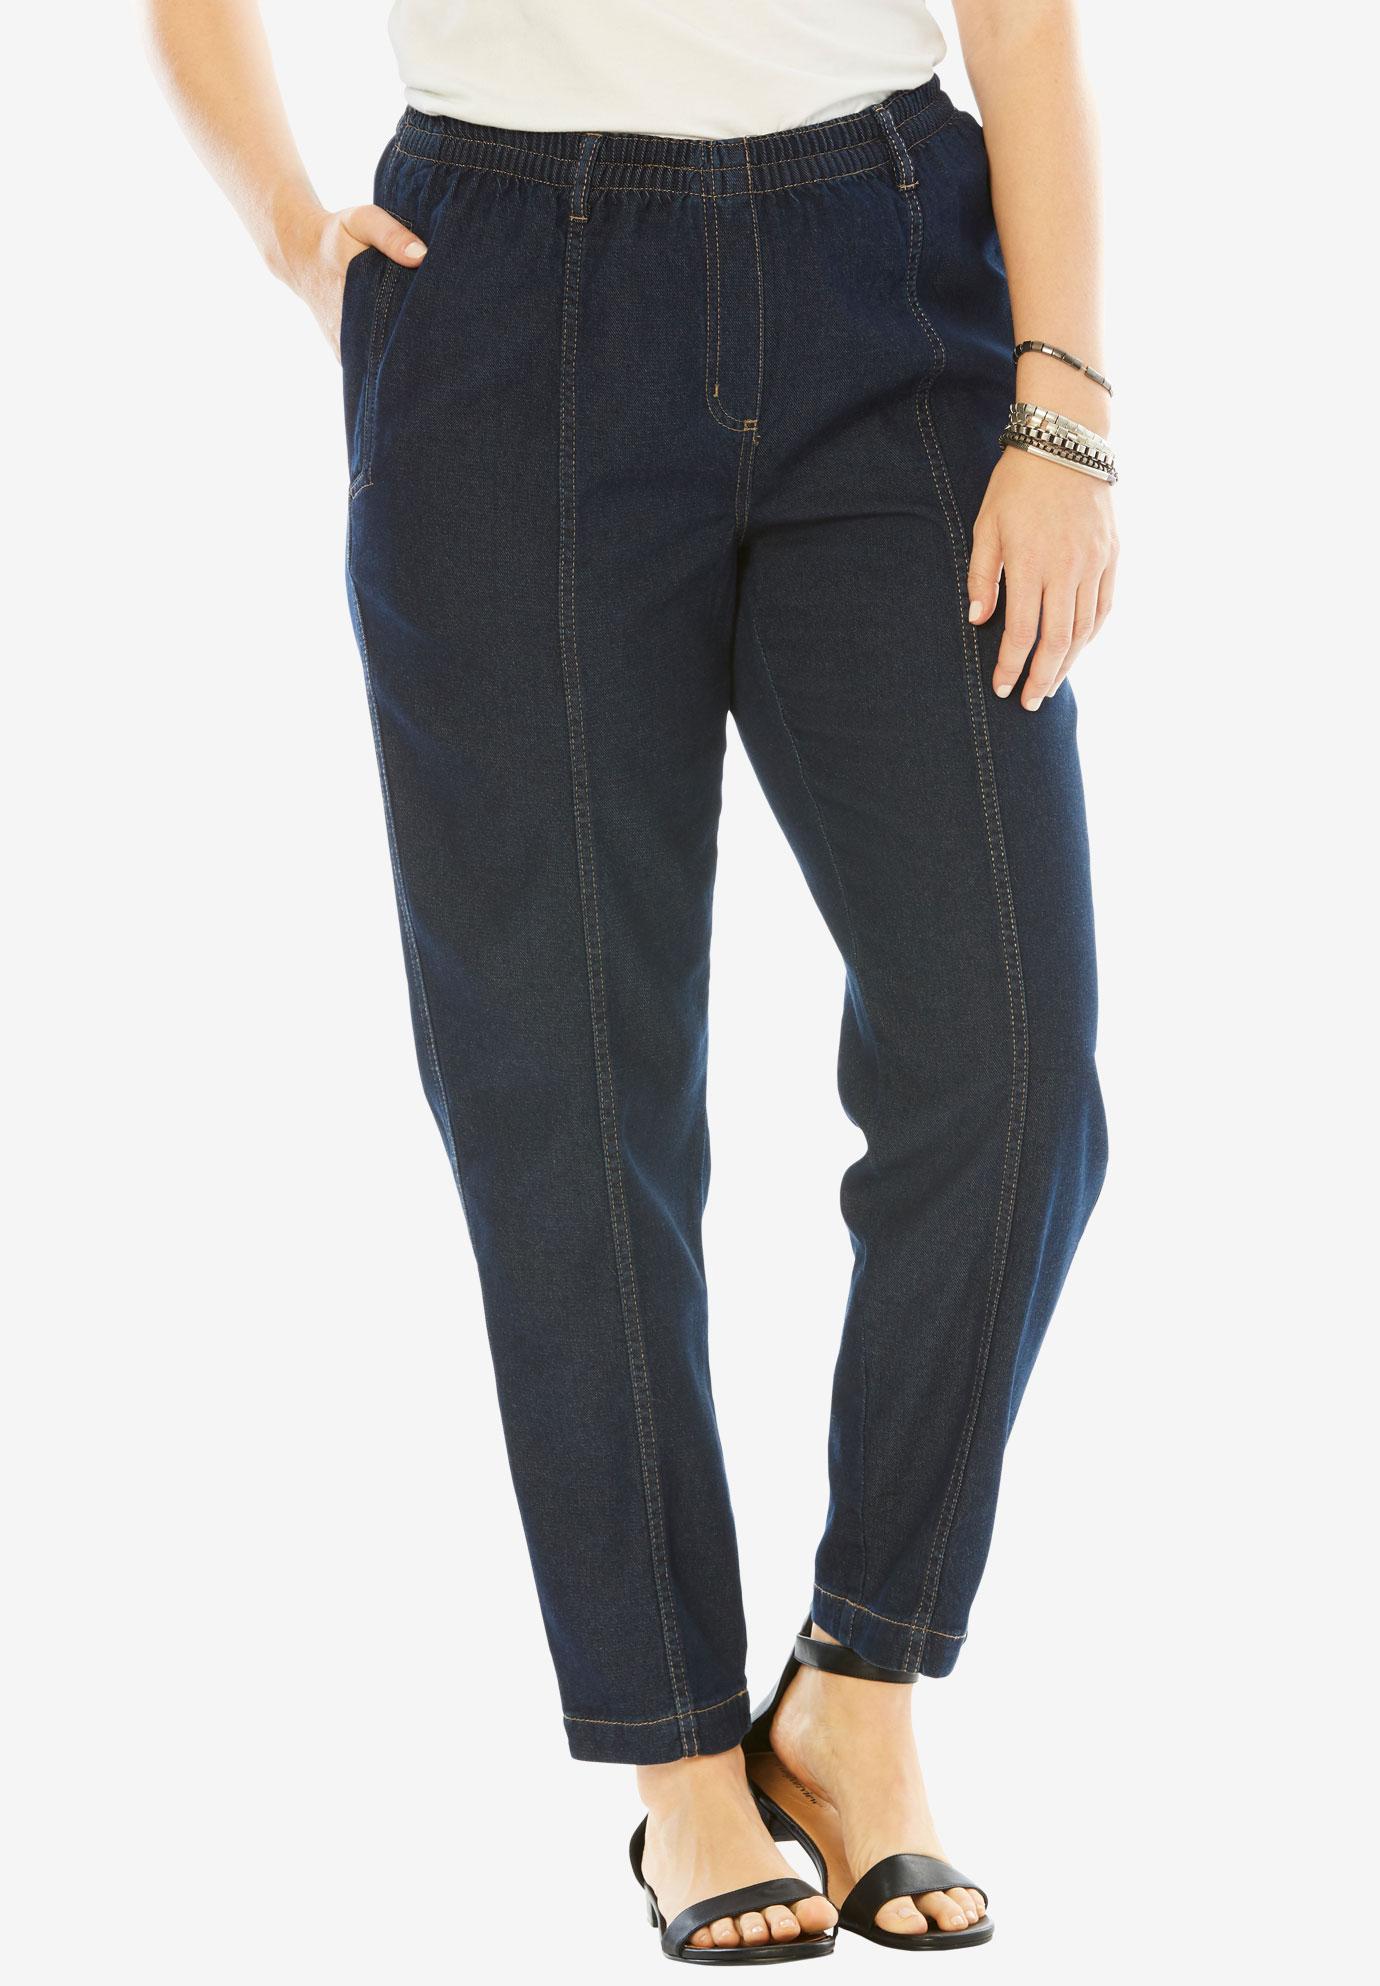 Kate Elastic Waist Jeans   Plus Size Denim Shop   Full Beauty